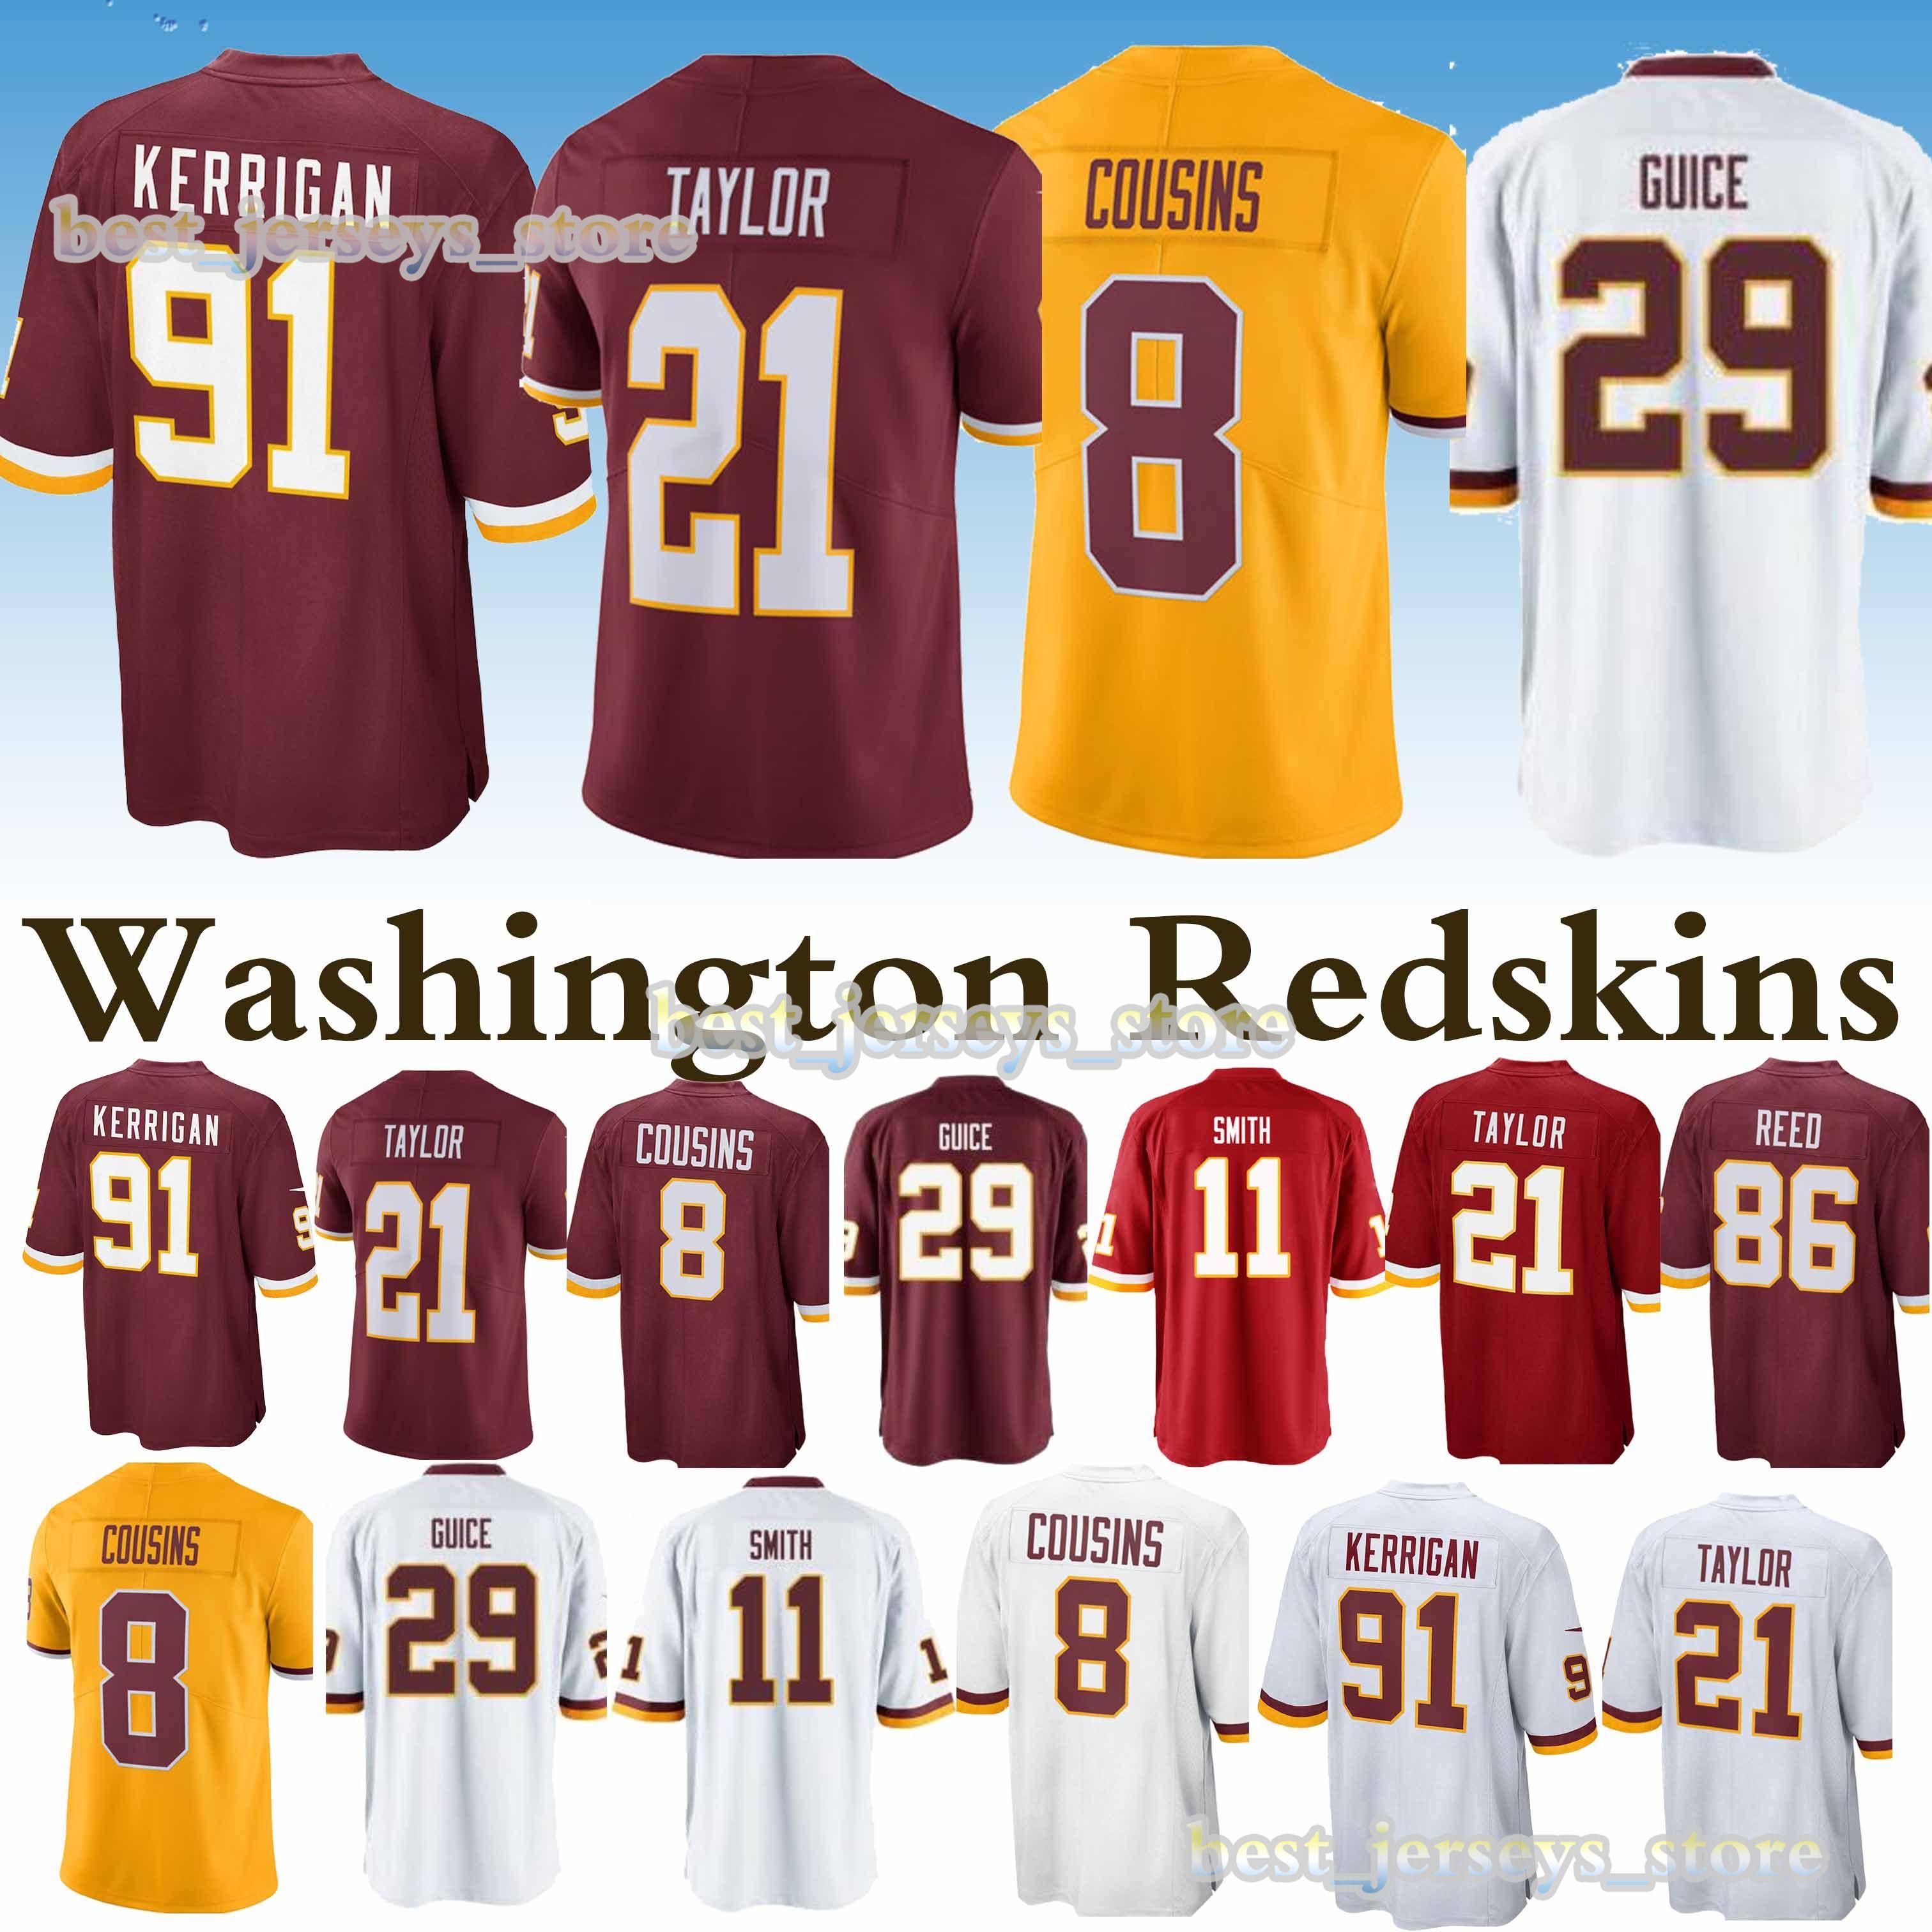 official photos 61635 2a894 2019 91 Ryan Kerrigan 11 Alex Smith Washington Jerseys Redskins 21 Sean  Taylor 29 Derrius Guice 8 Kirk Cousins Jersey 2019 Design Sweater From ...